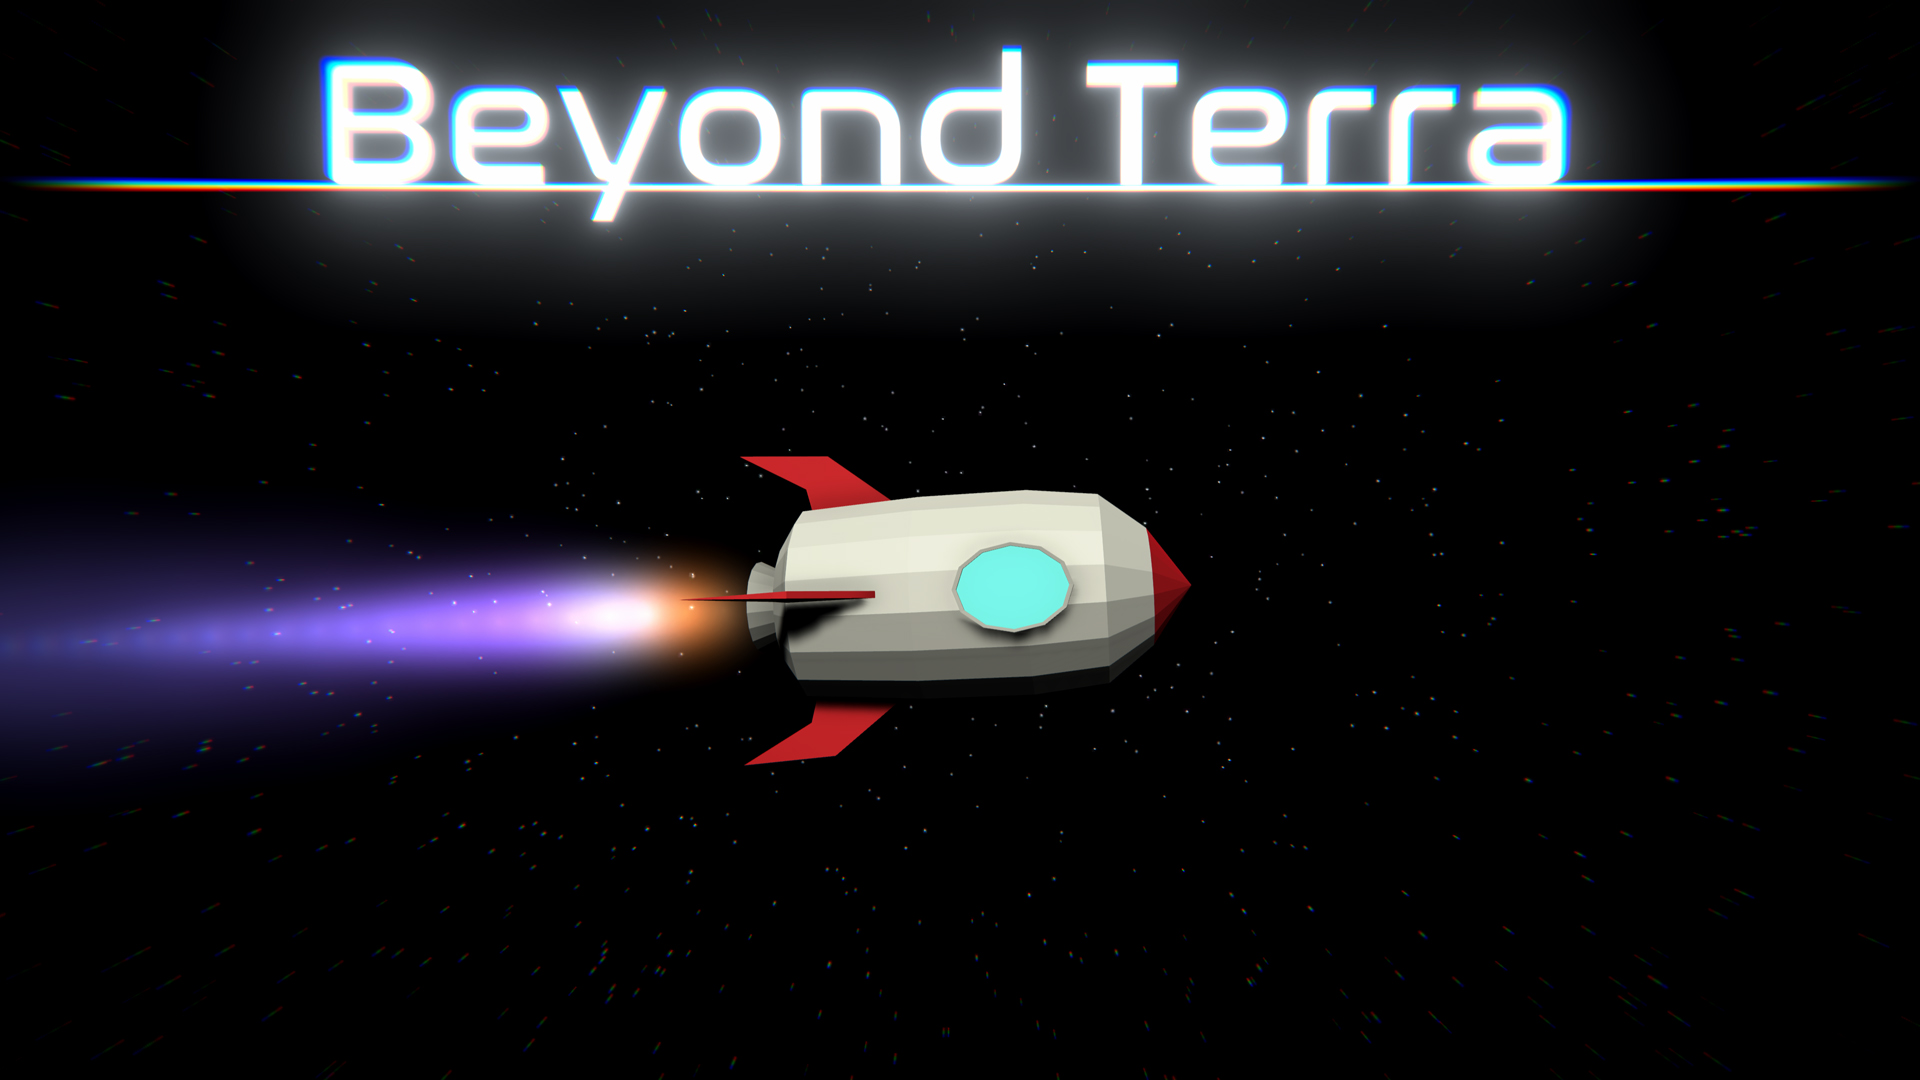 Beyond Terra